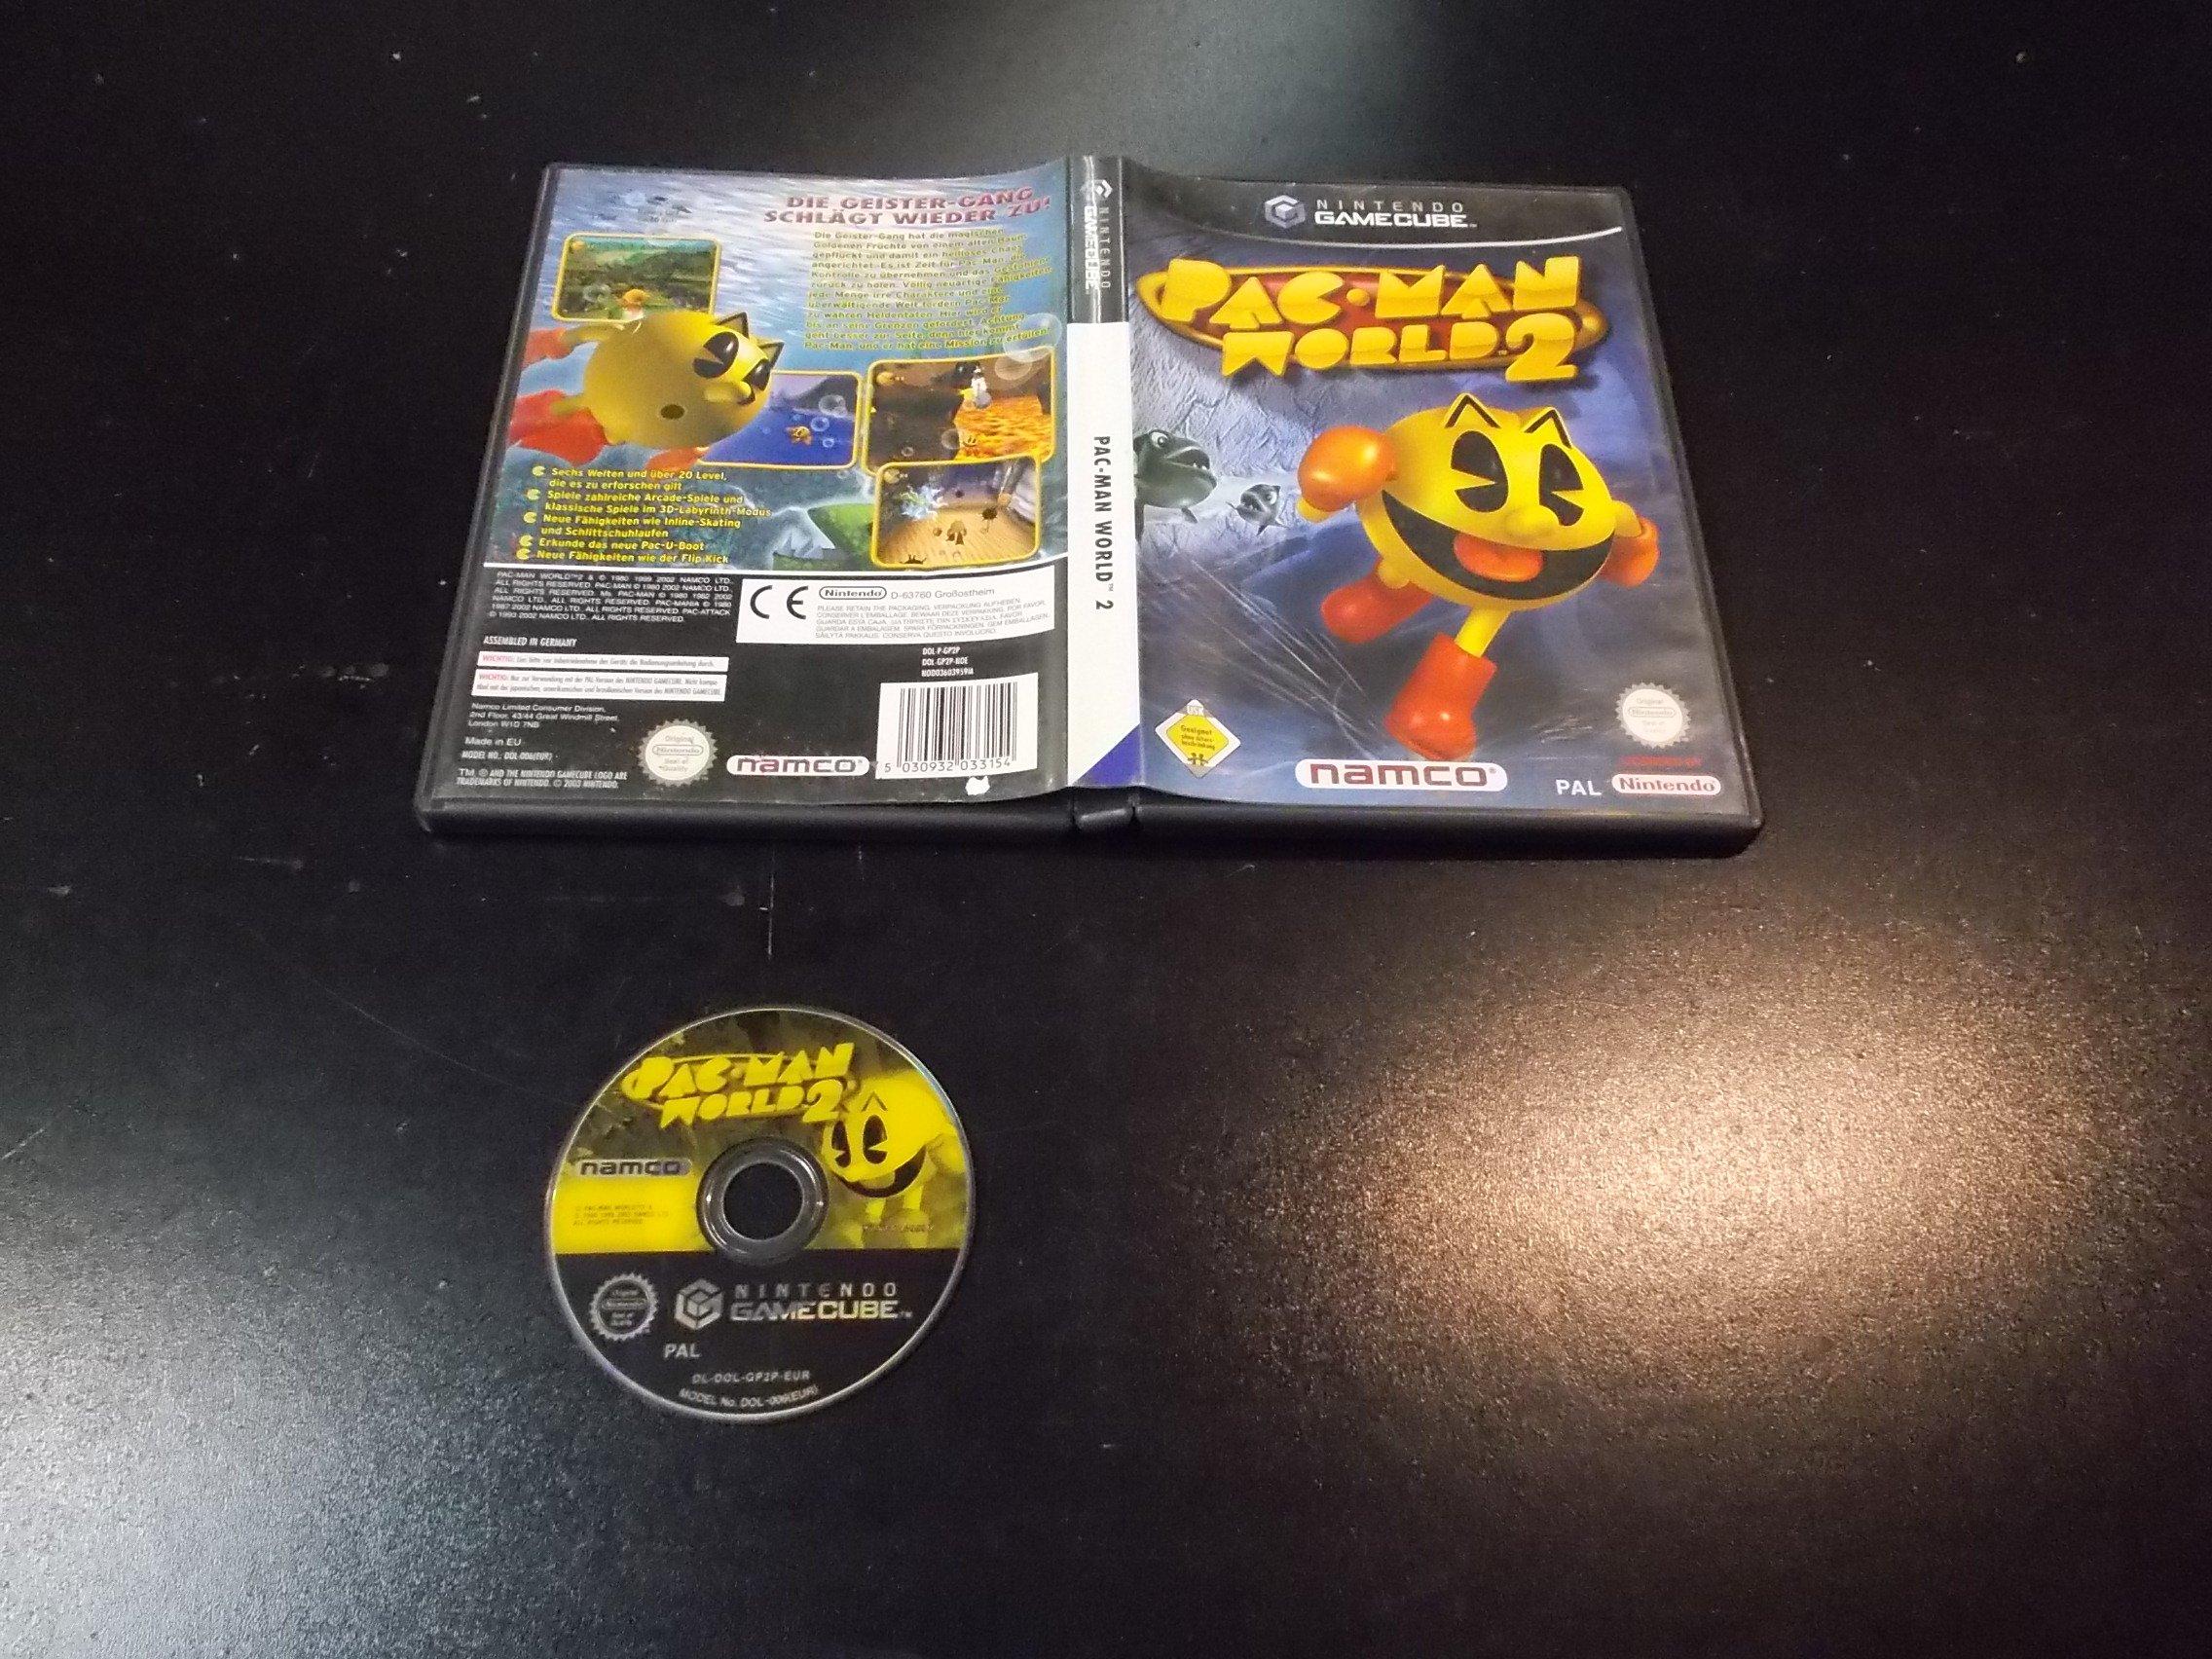 PAC-MAN WORLD - GRA Nintendo GameCube - Sklep